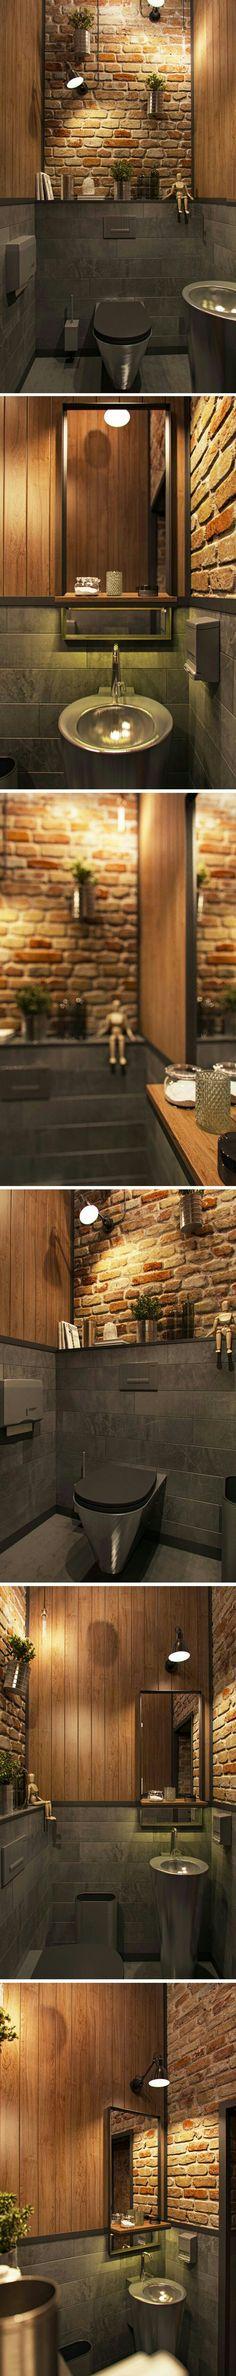 Bath Room Rustic Design Toilets 41 Ideas For 2019 Bathroom Interior Design, Interior Design Living Room, Interior Livingroom, Loft Design, House Design, Bares Y Pubs, Deco Cool, Toilet Room, Toilet Design